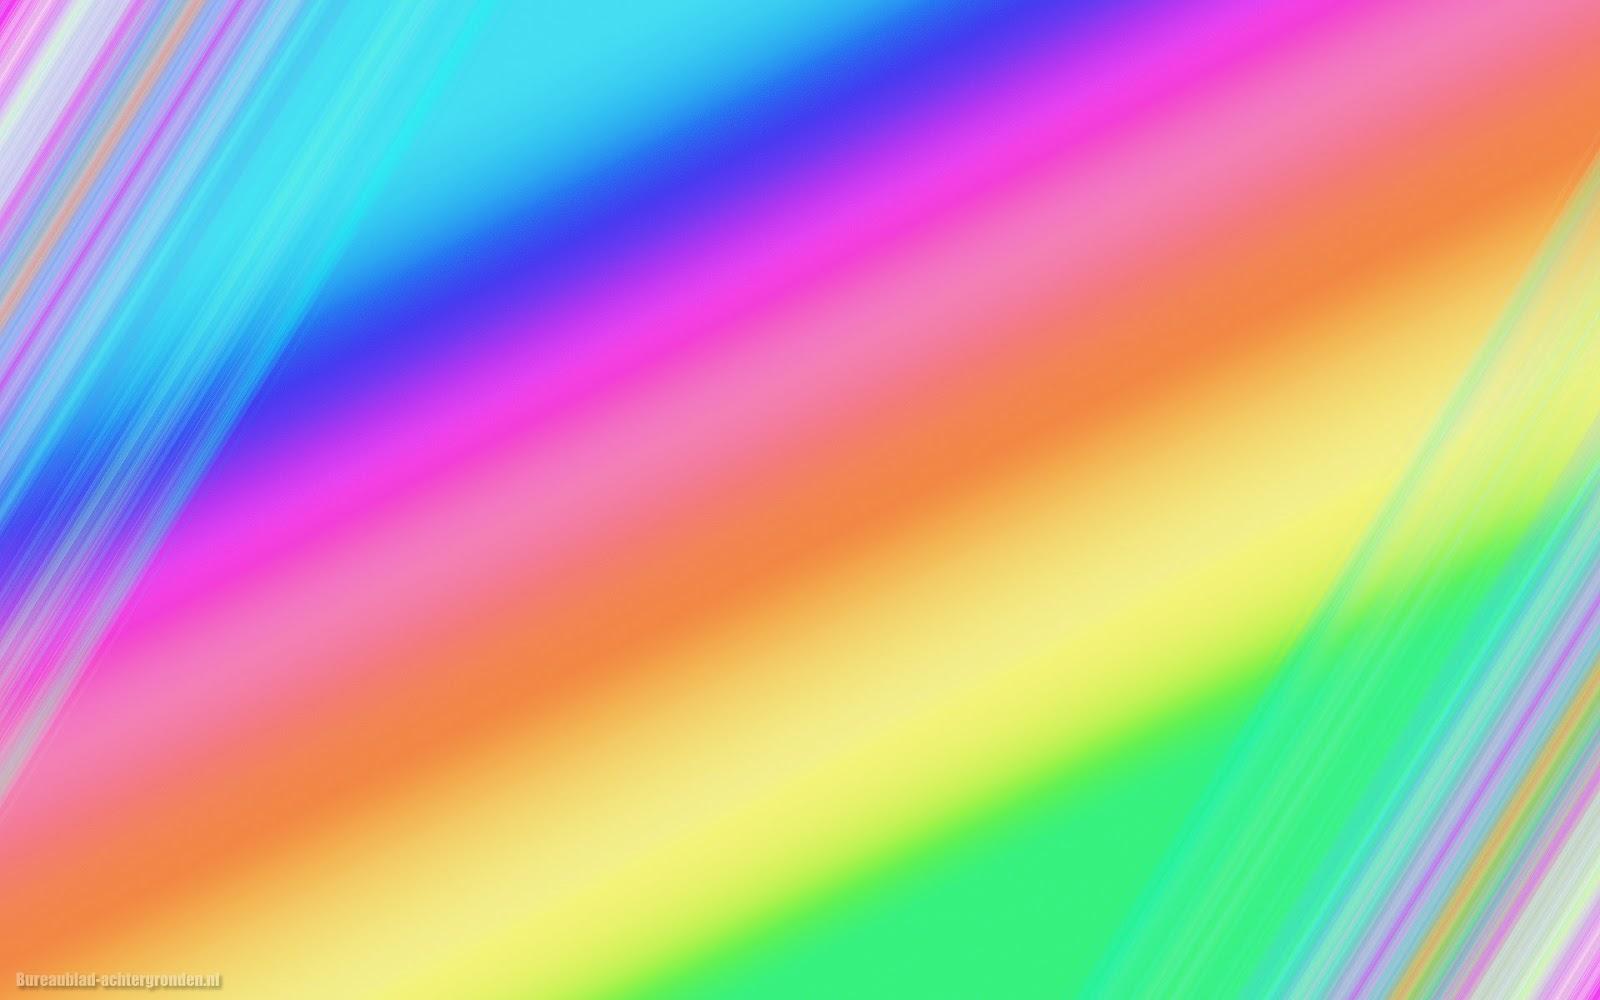 Kleurige abstracte achtergrond